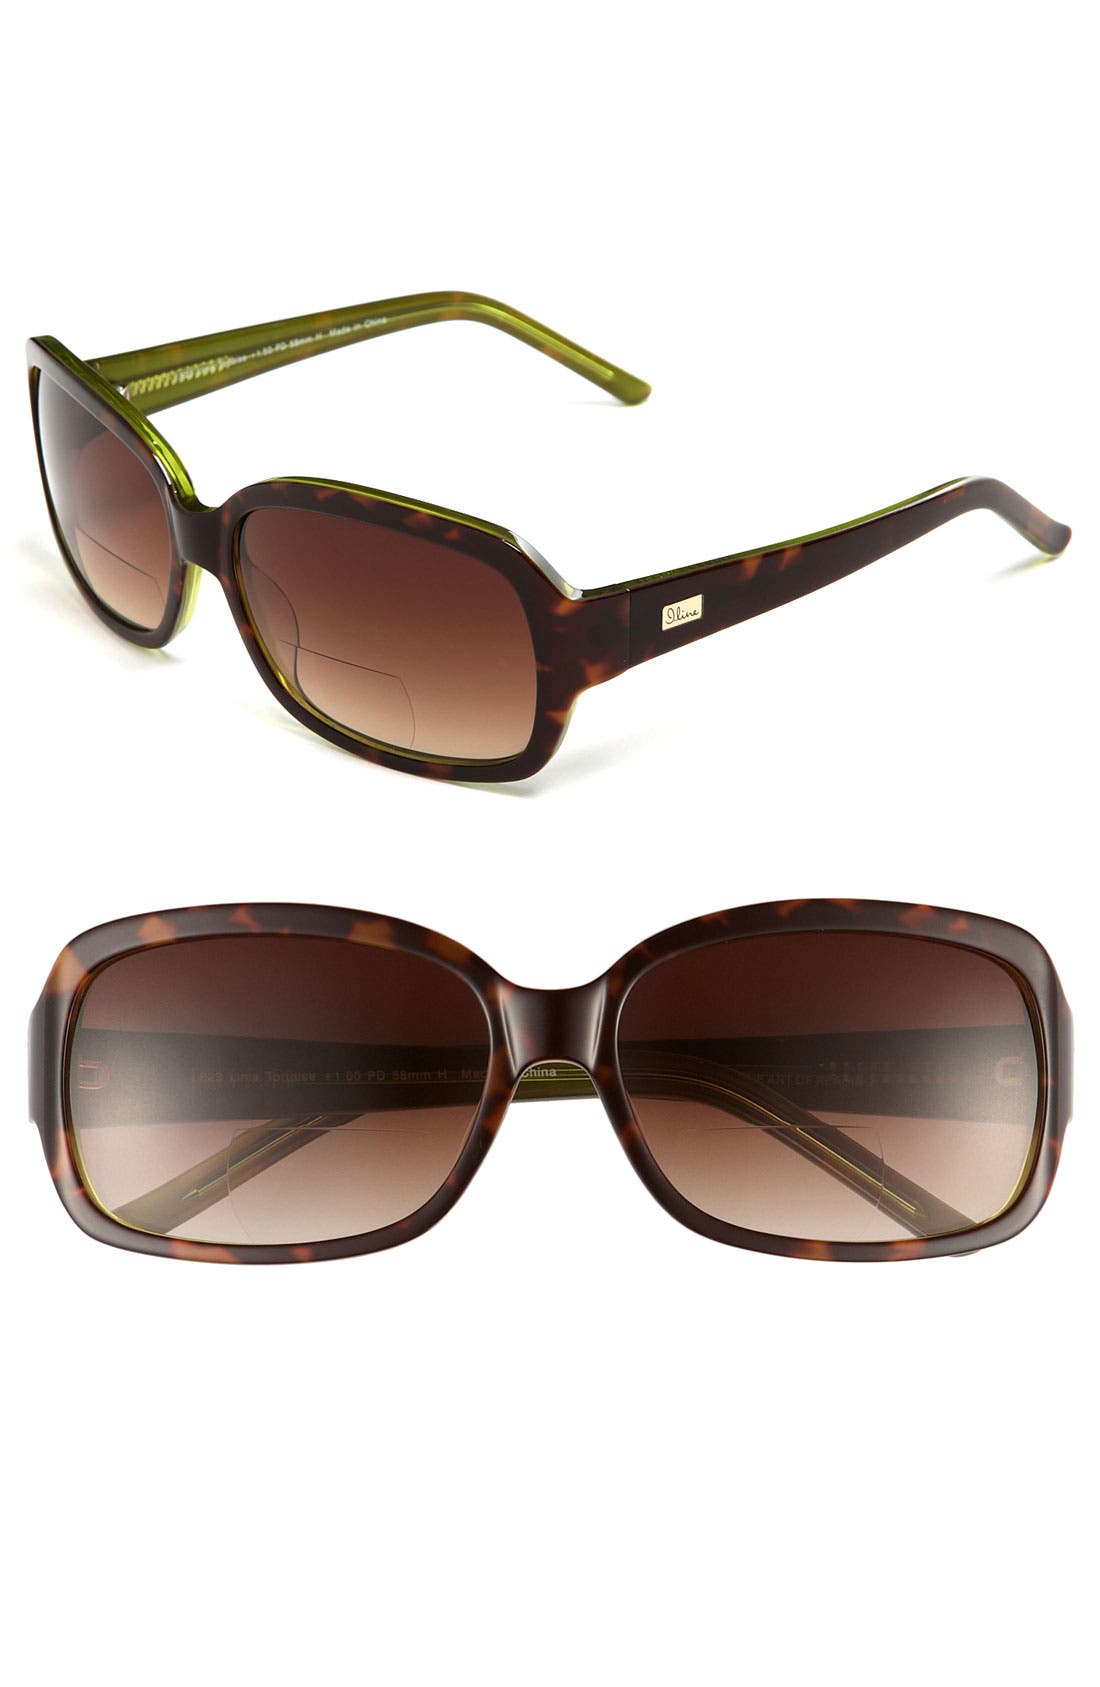 Main Image - I Line Eyewear 'Lime Tortoise' 60mm Reading Sunglasses